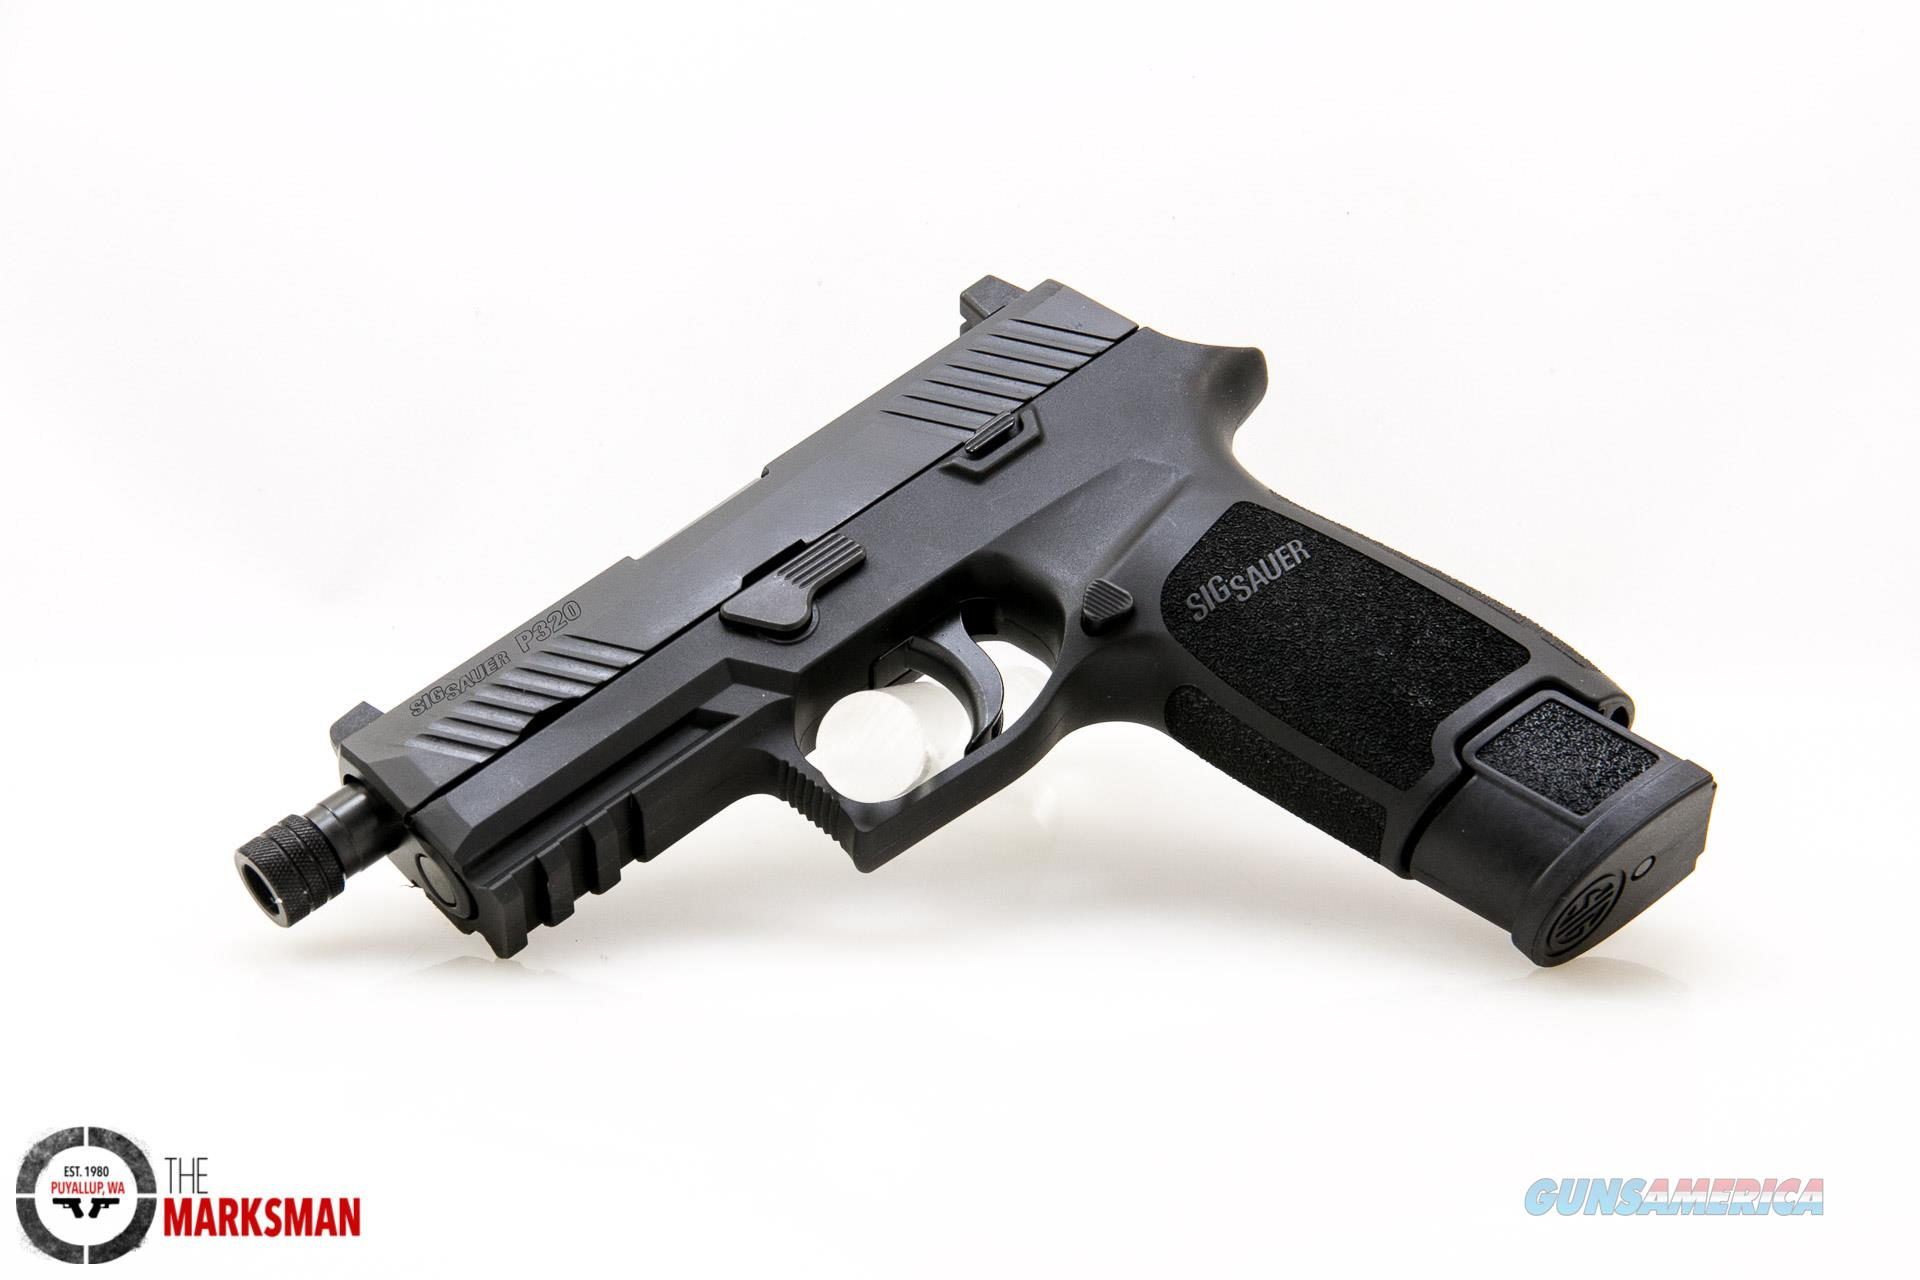 Sig Sauer P320 TacOps 9mm NEW Threaded Barrel Free Shipping  Guns > Pistols > Sig - Sauer/Sigarms Pistols > P320